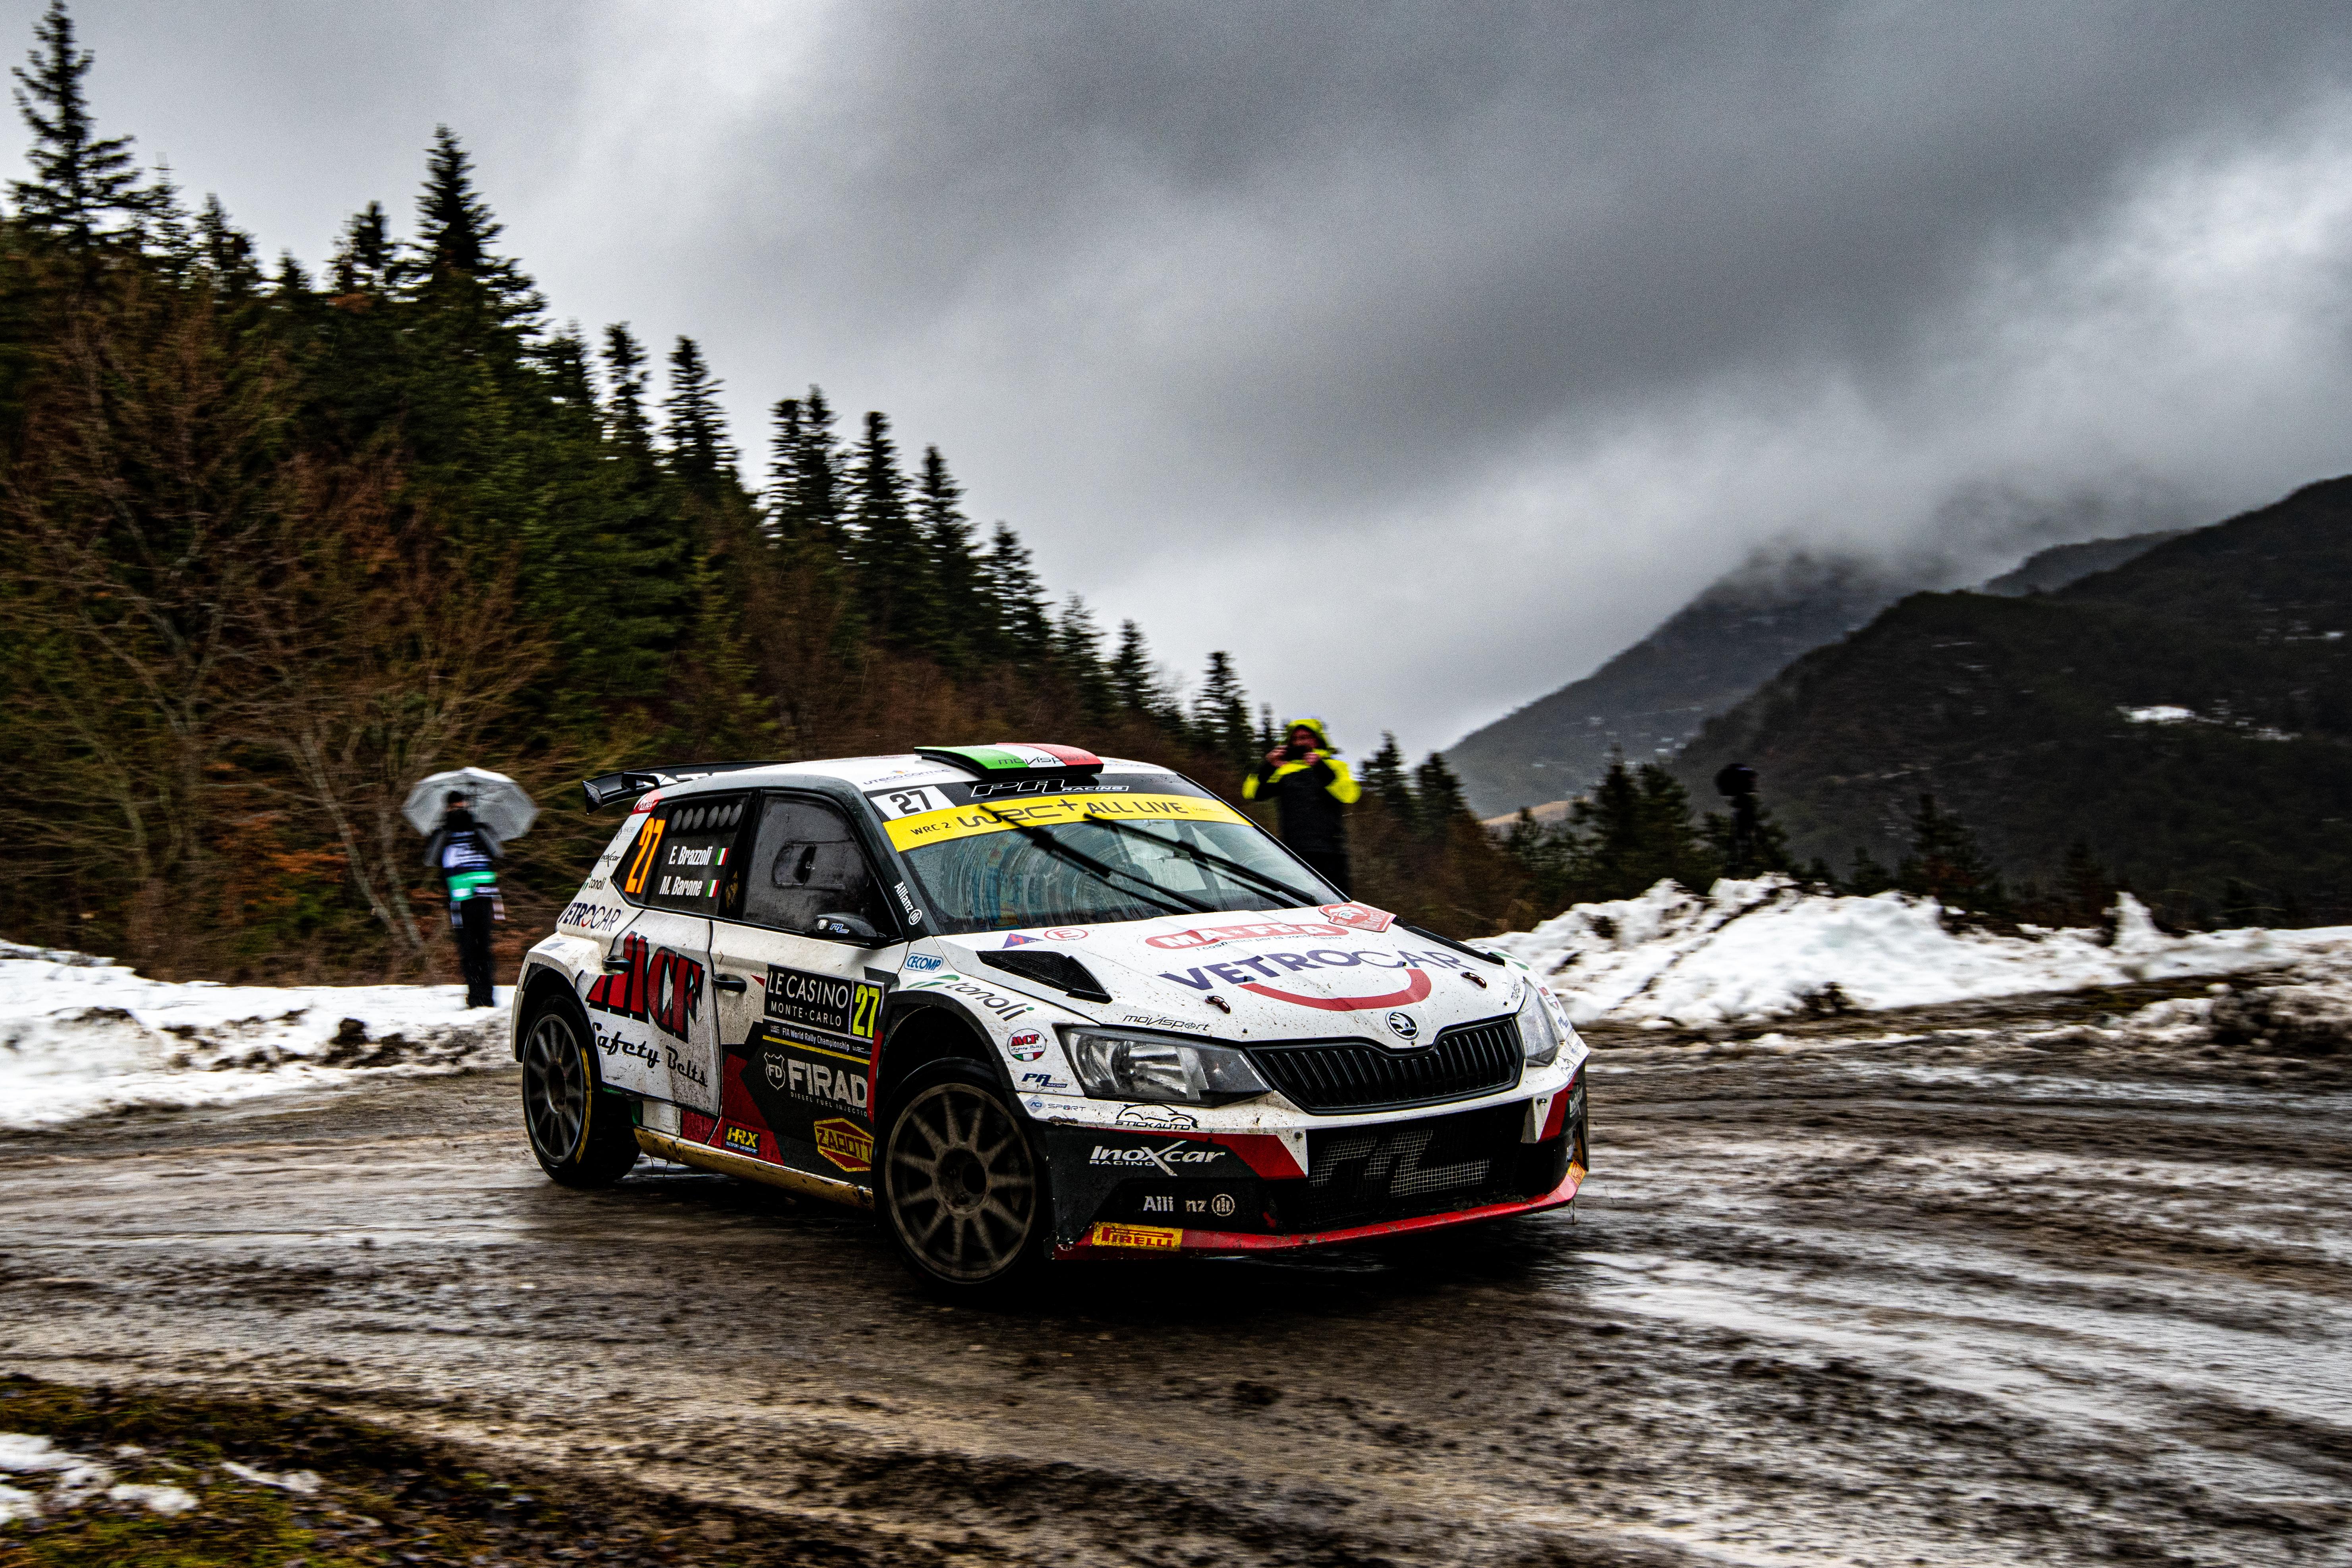 Rallye Monte-Carlo: SKODA FABIA Rally2 evo driver Mikkelsen starts as WRC2 leader into last leg - Image 8